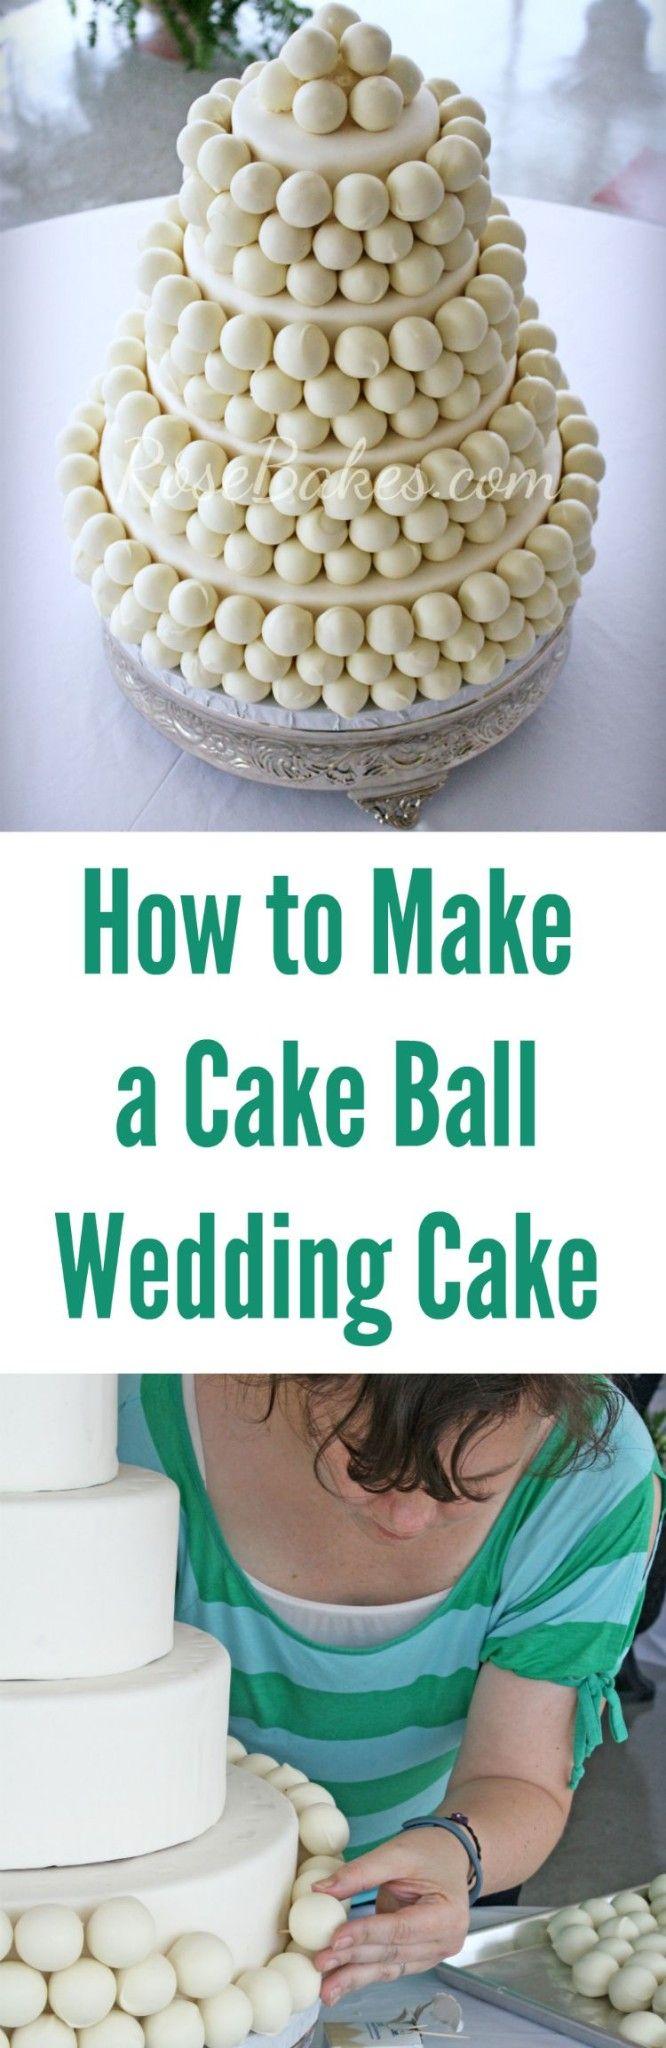 How to Make a Cake Ball Wedding Cake by @rosebakes #cakepops #weddingideas